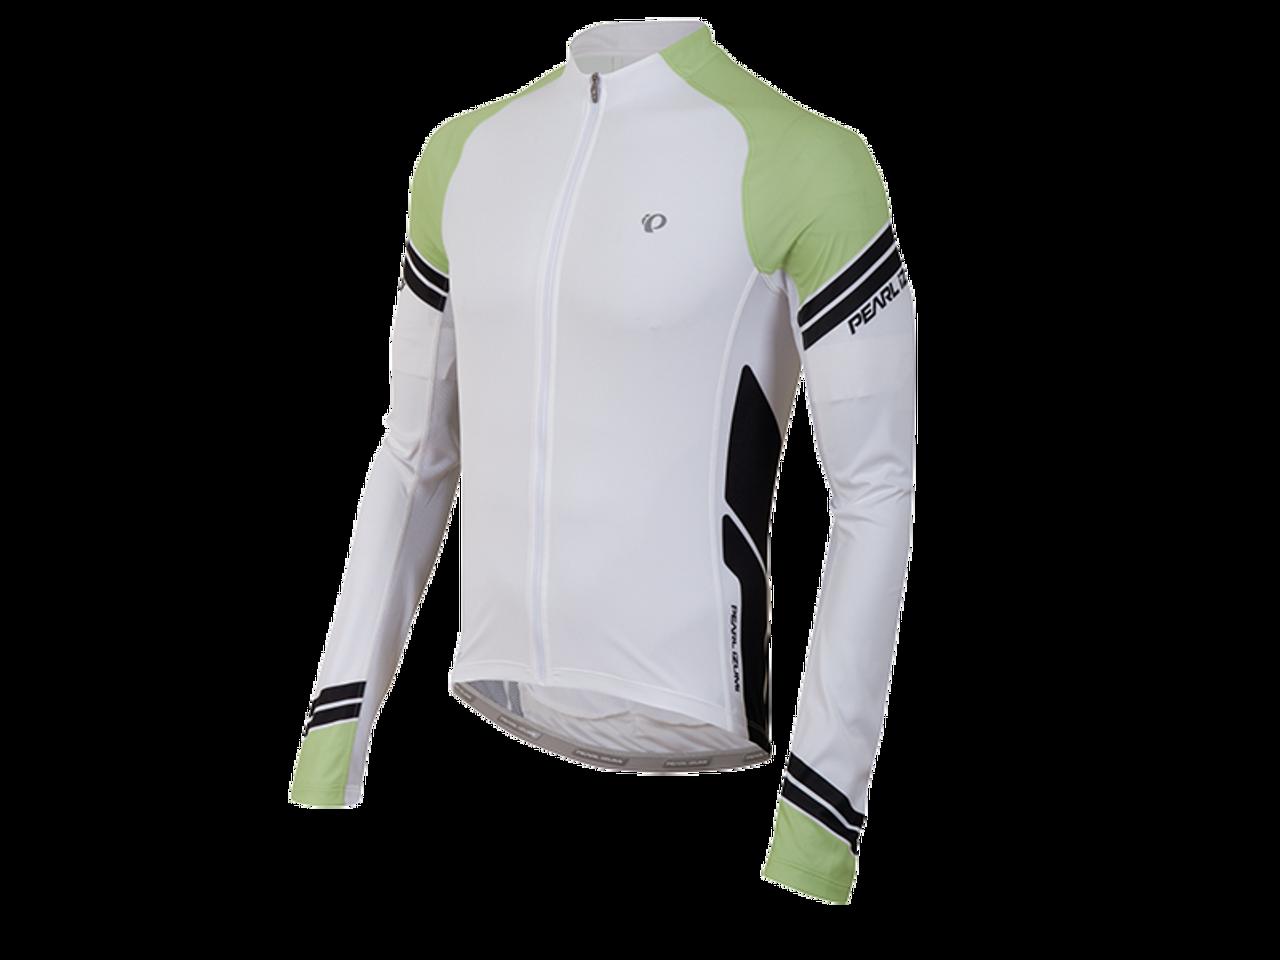 3fb1e7082 Texas Cyclesport Pearl izumi Elite Long Sleeve Jersey PI-ETT-LS 119.99 New